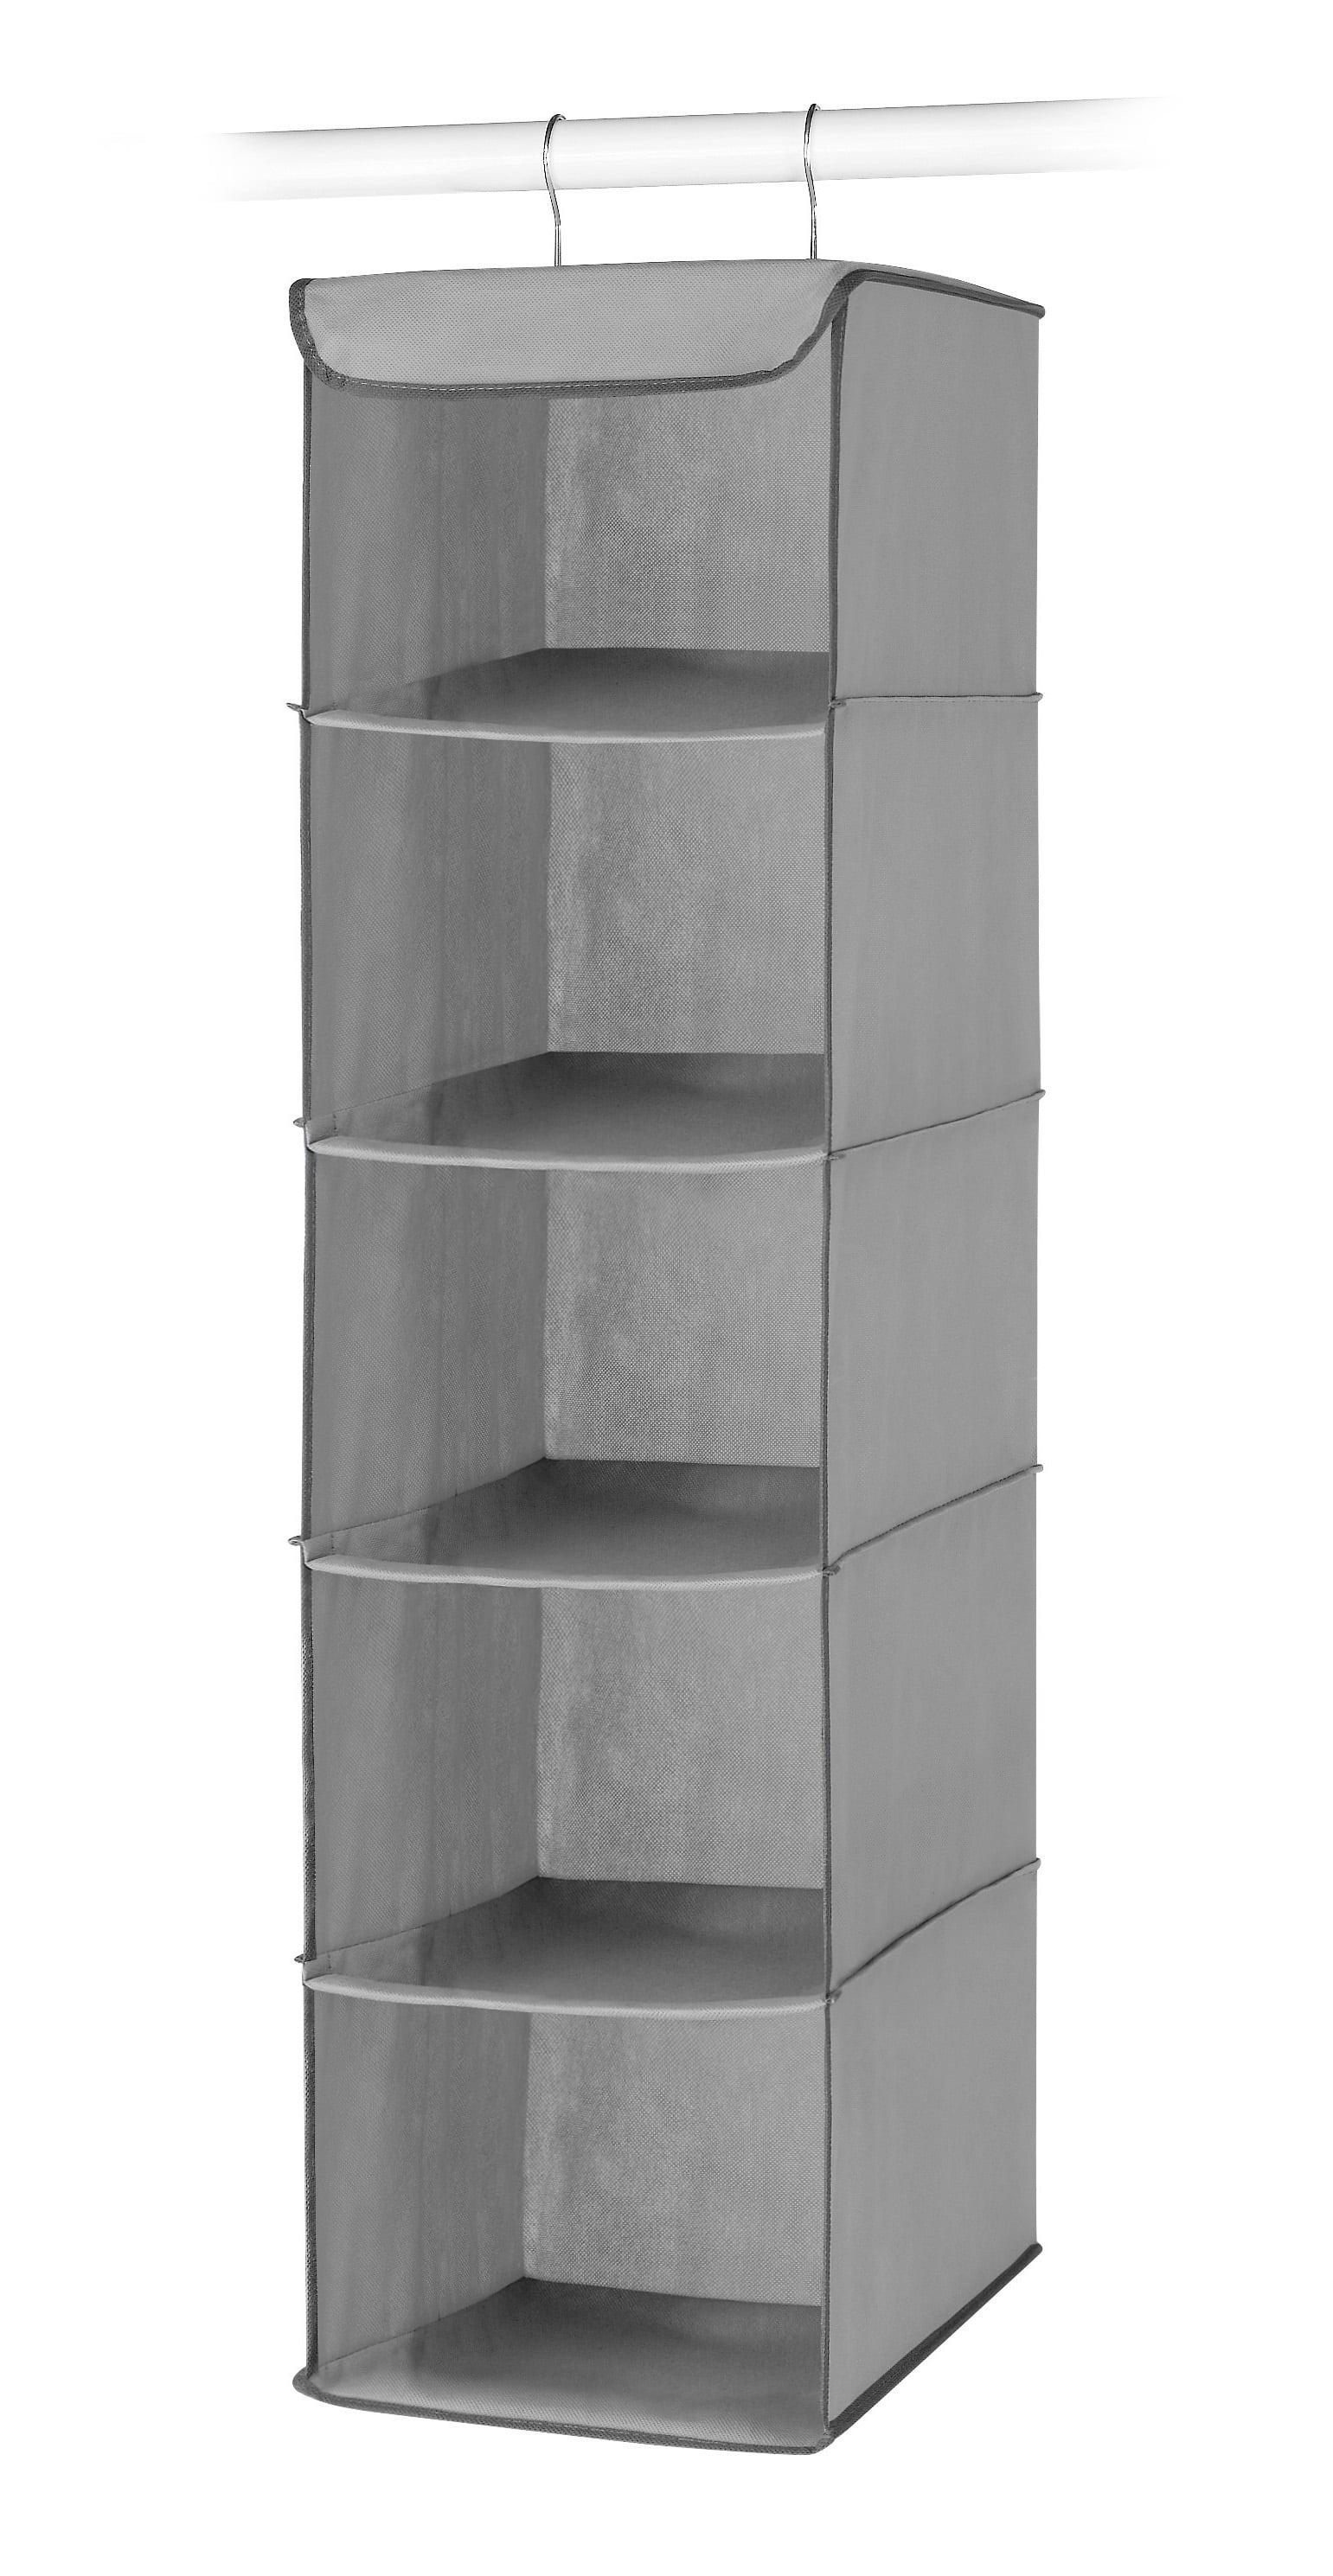 Honey-Can-Do 8-Shelf Hanging Organizer Home Garage Storage Unit Holder Rack New